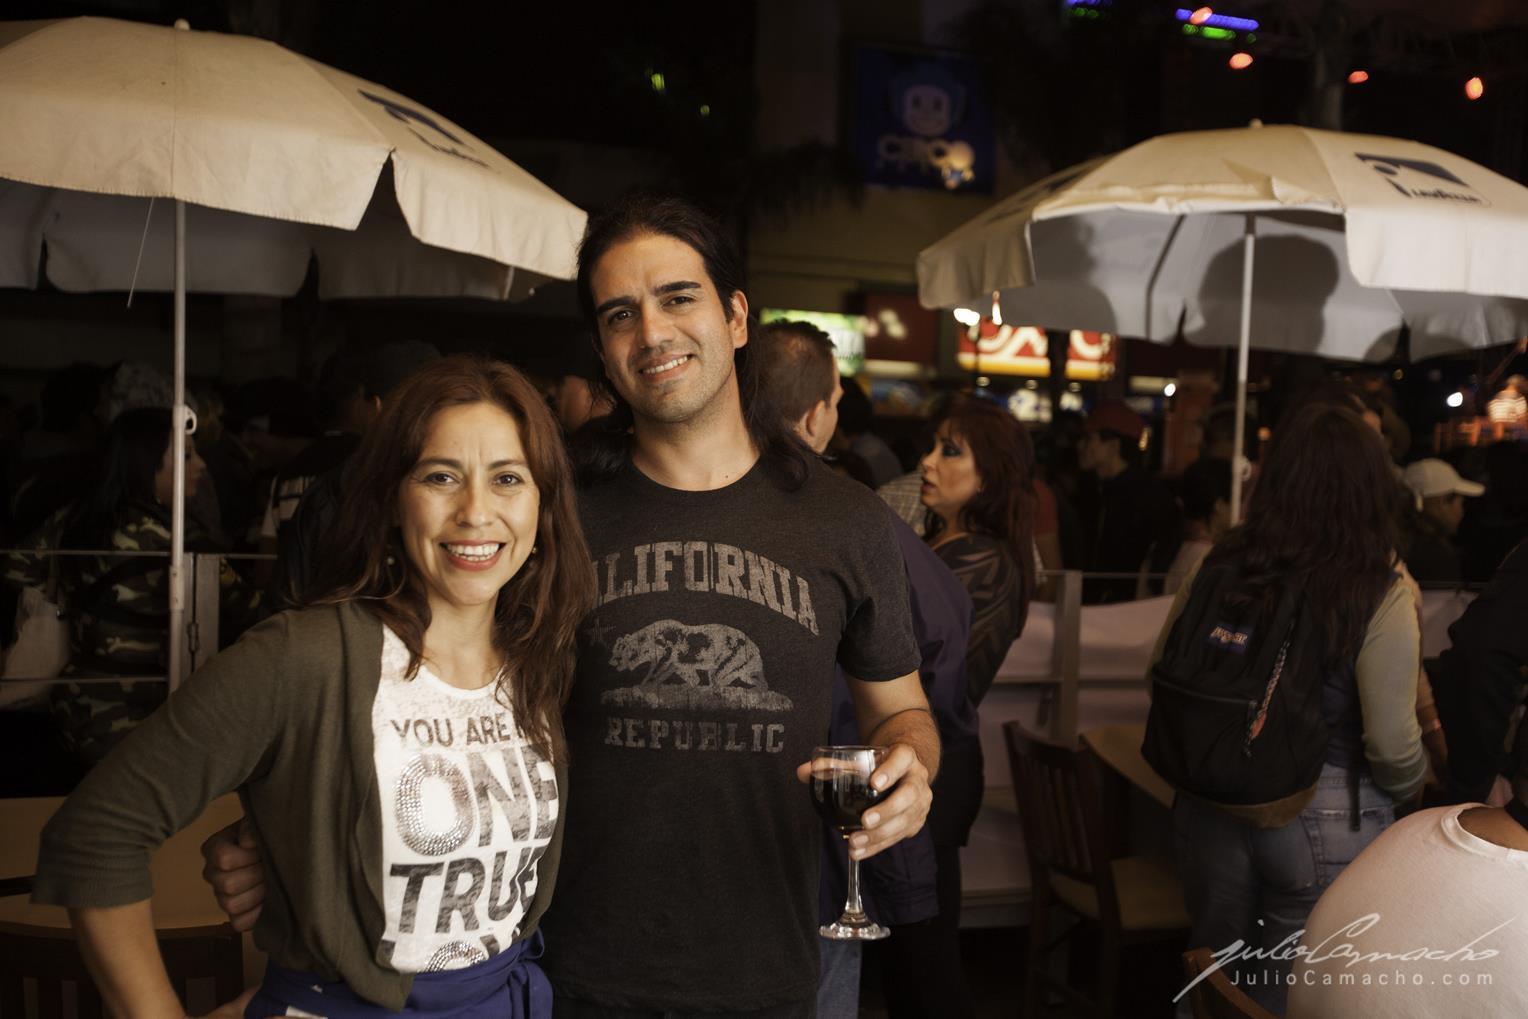 2014-10-30 31 CAST TOUR Ensenada y Tijuana - 1826 - www.Juli (Copy).jpg